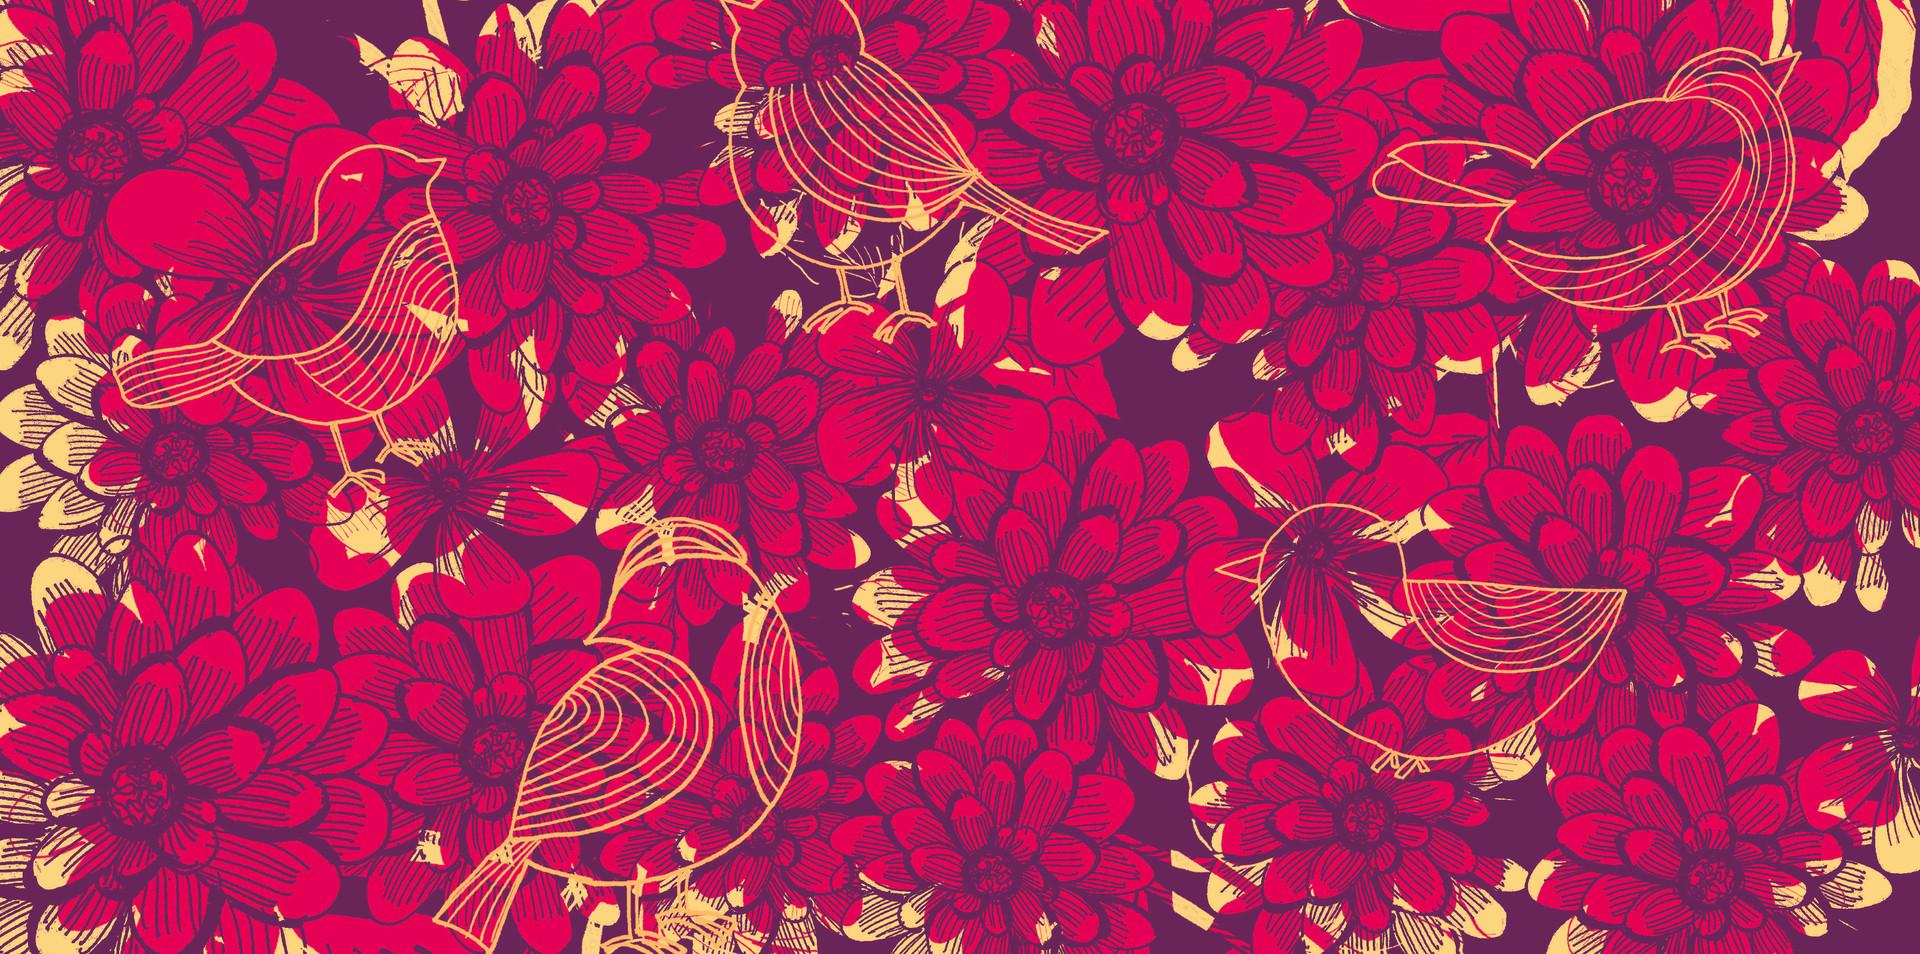 FLOWERS_birds1.jpg